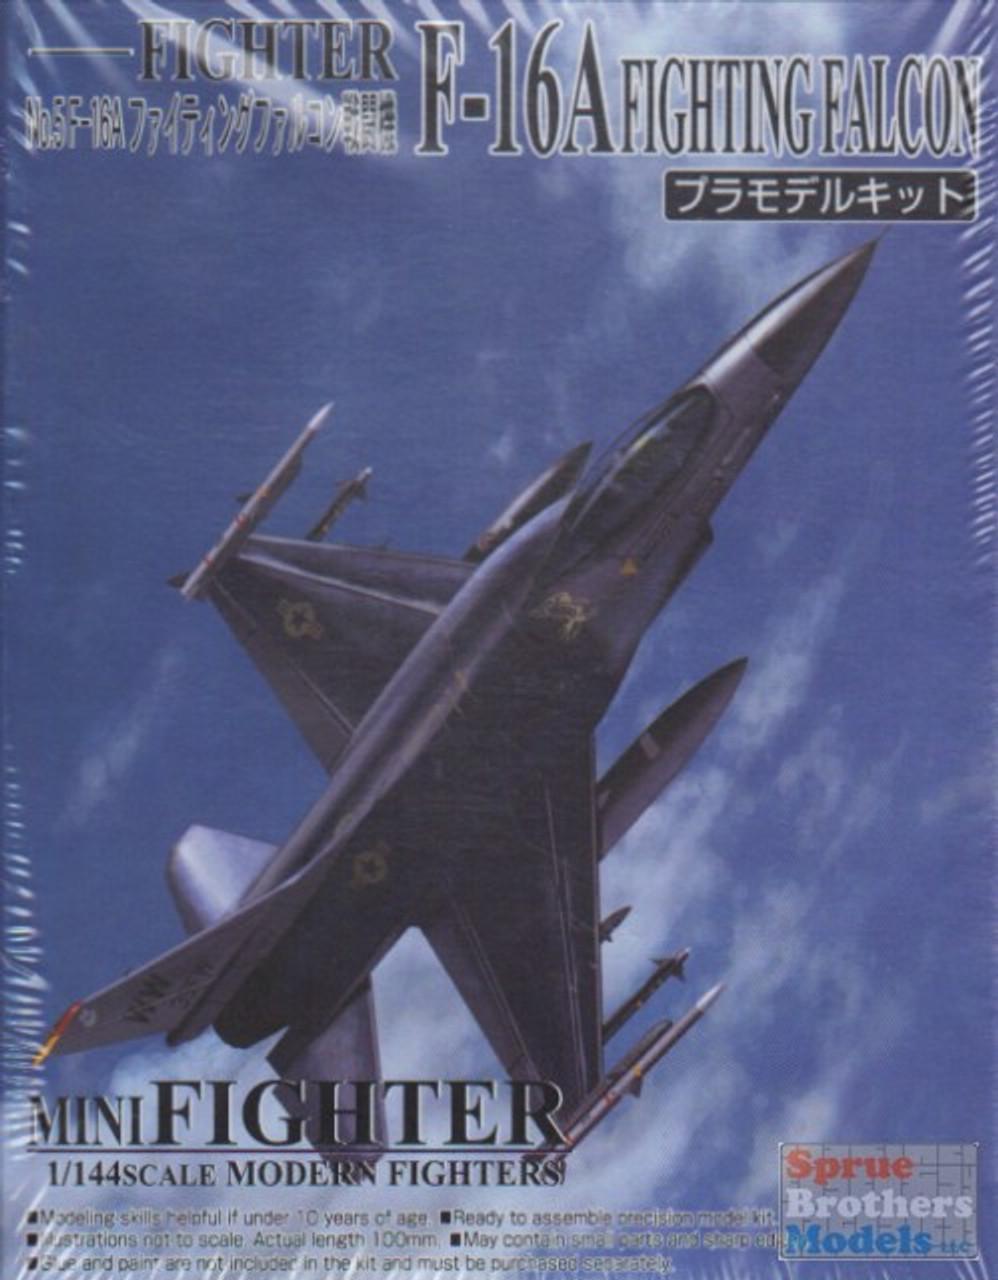 AOS35467 1:144 Aoshima F-16A Fighting Falcon